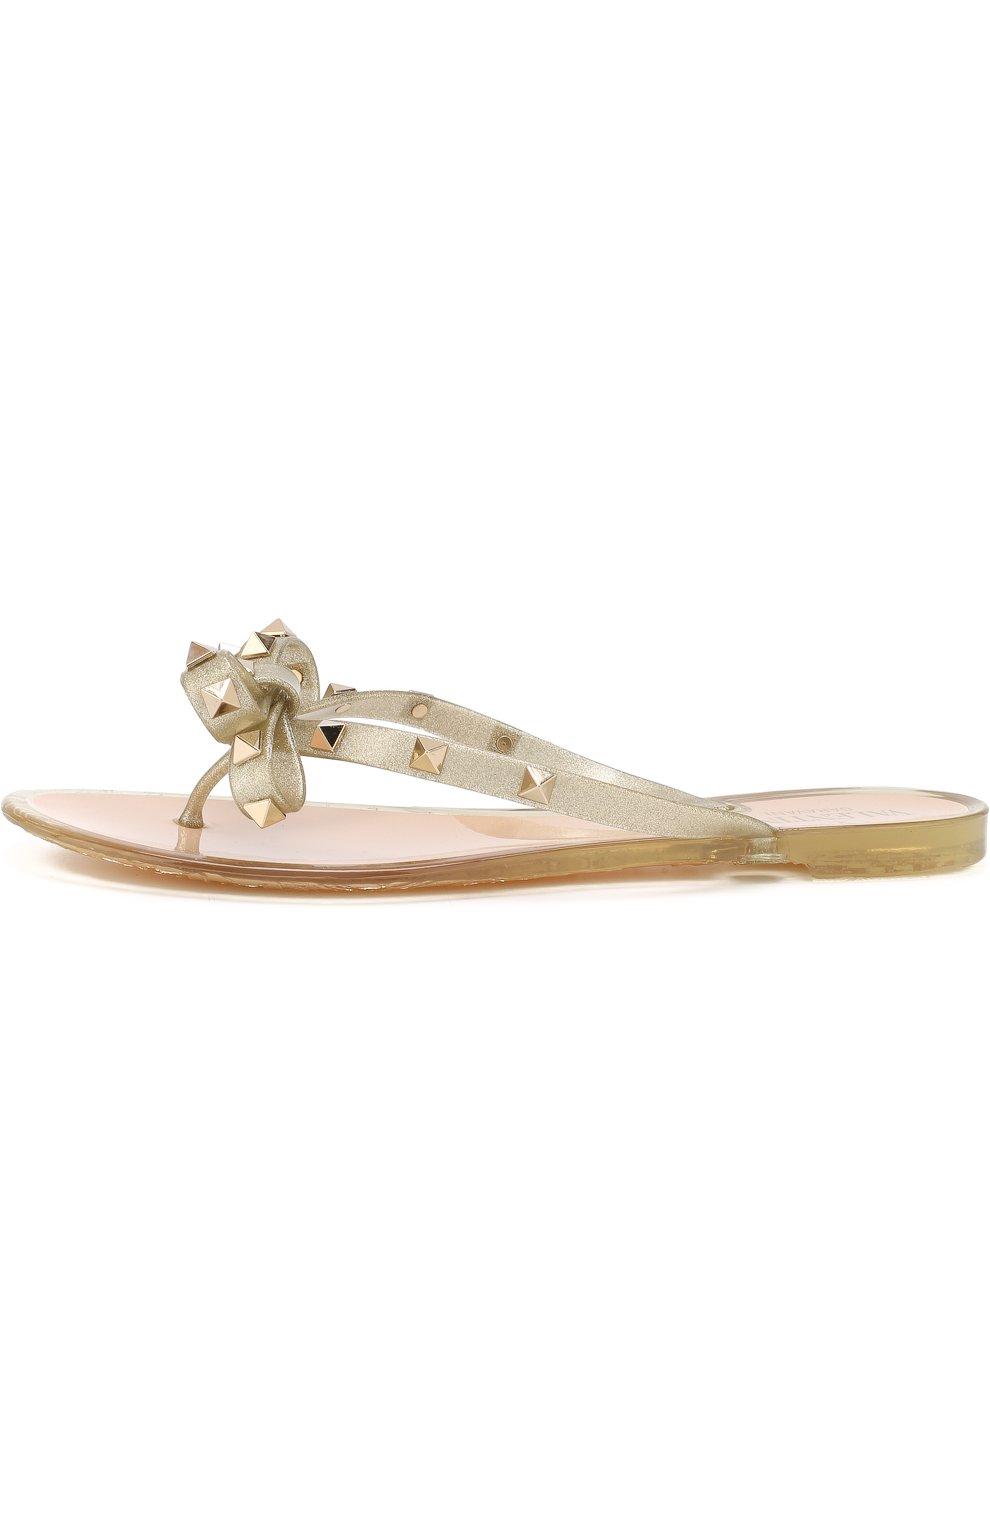 Резиновые шлепанцы Valentino Garavani Rockstud Valentino золотые | Фото №3